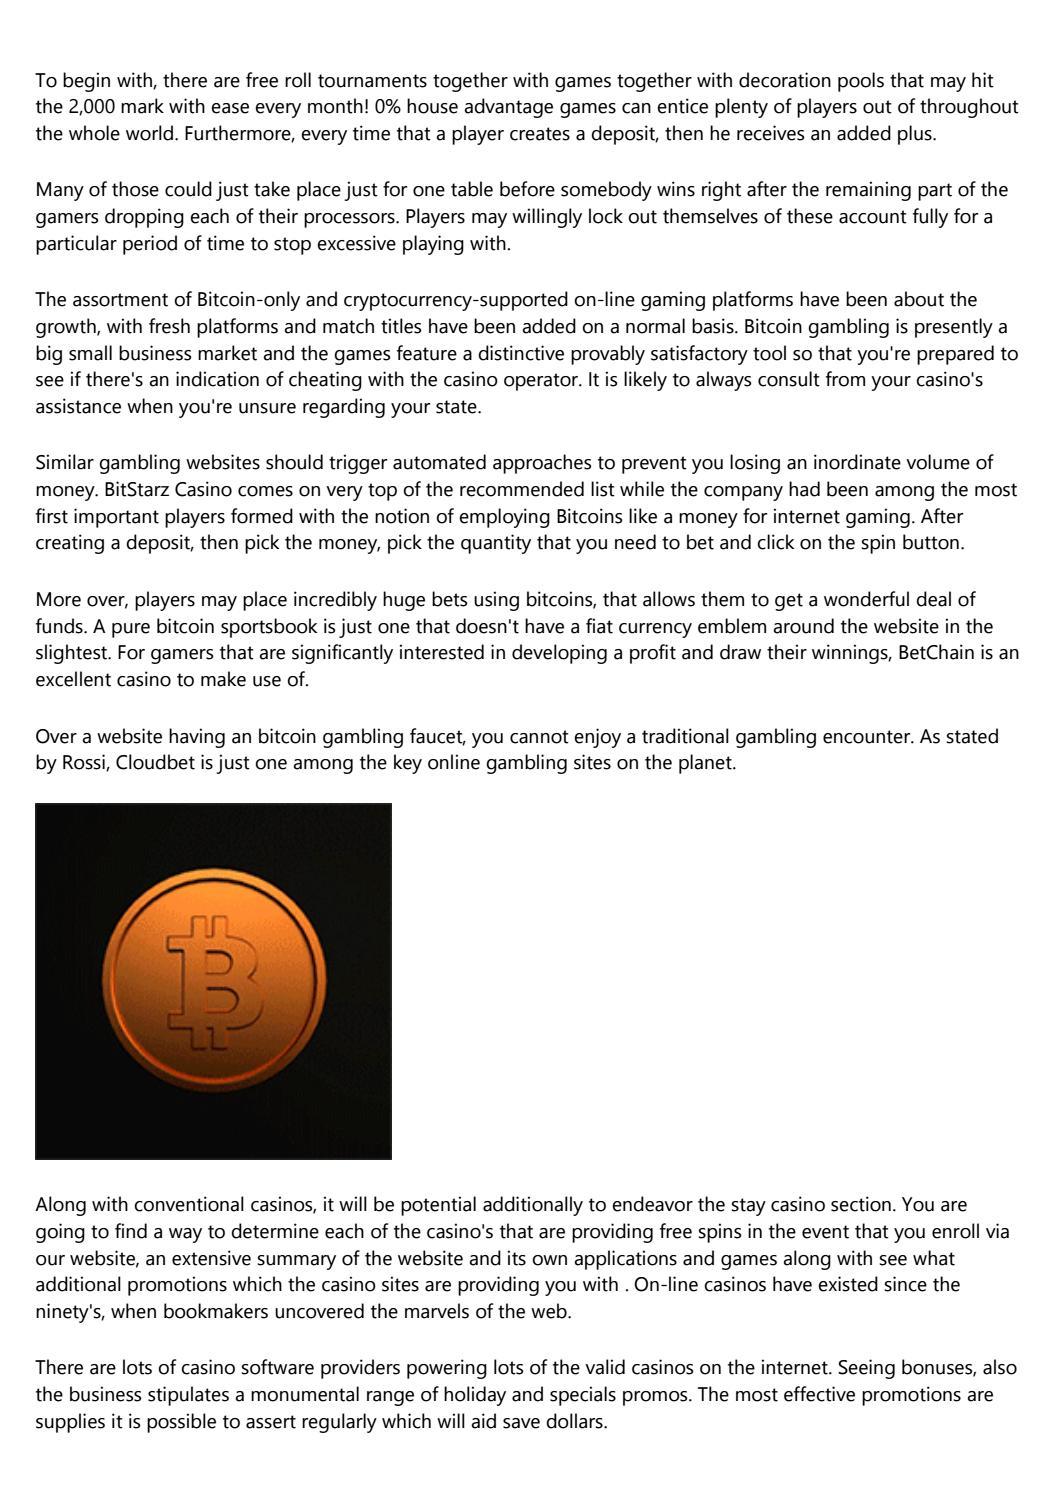 Gsn free online bitcoin casino games